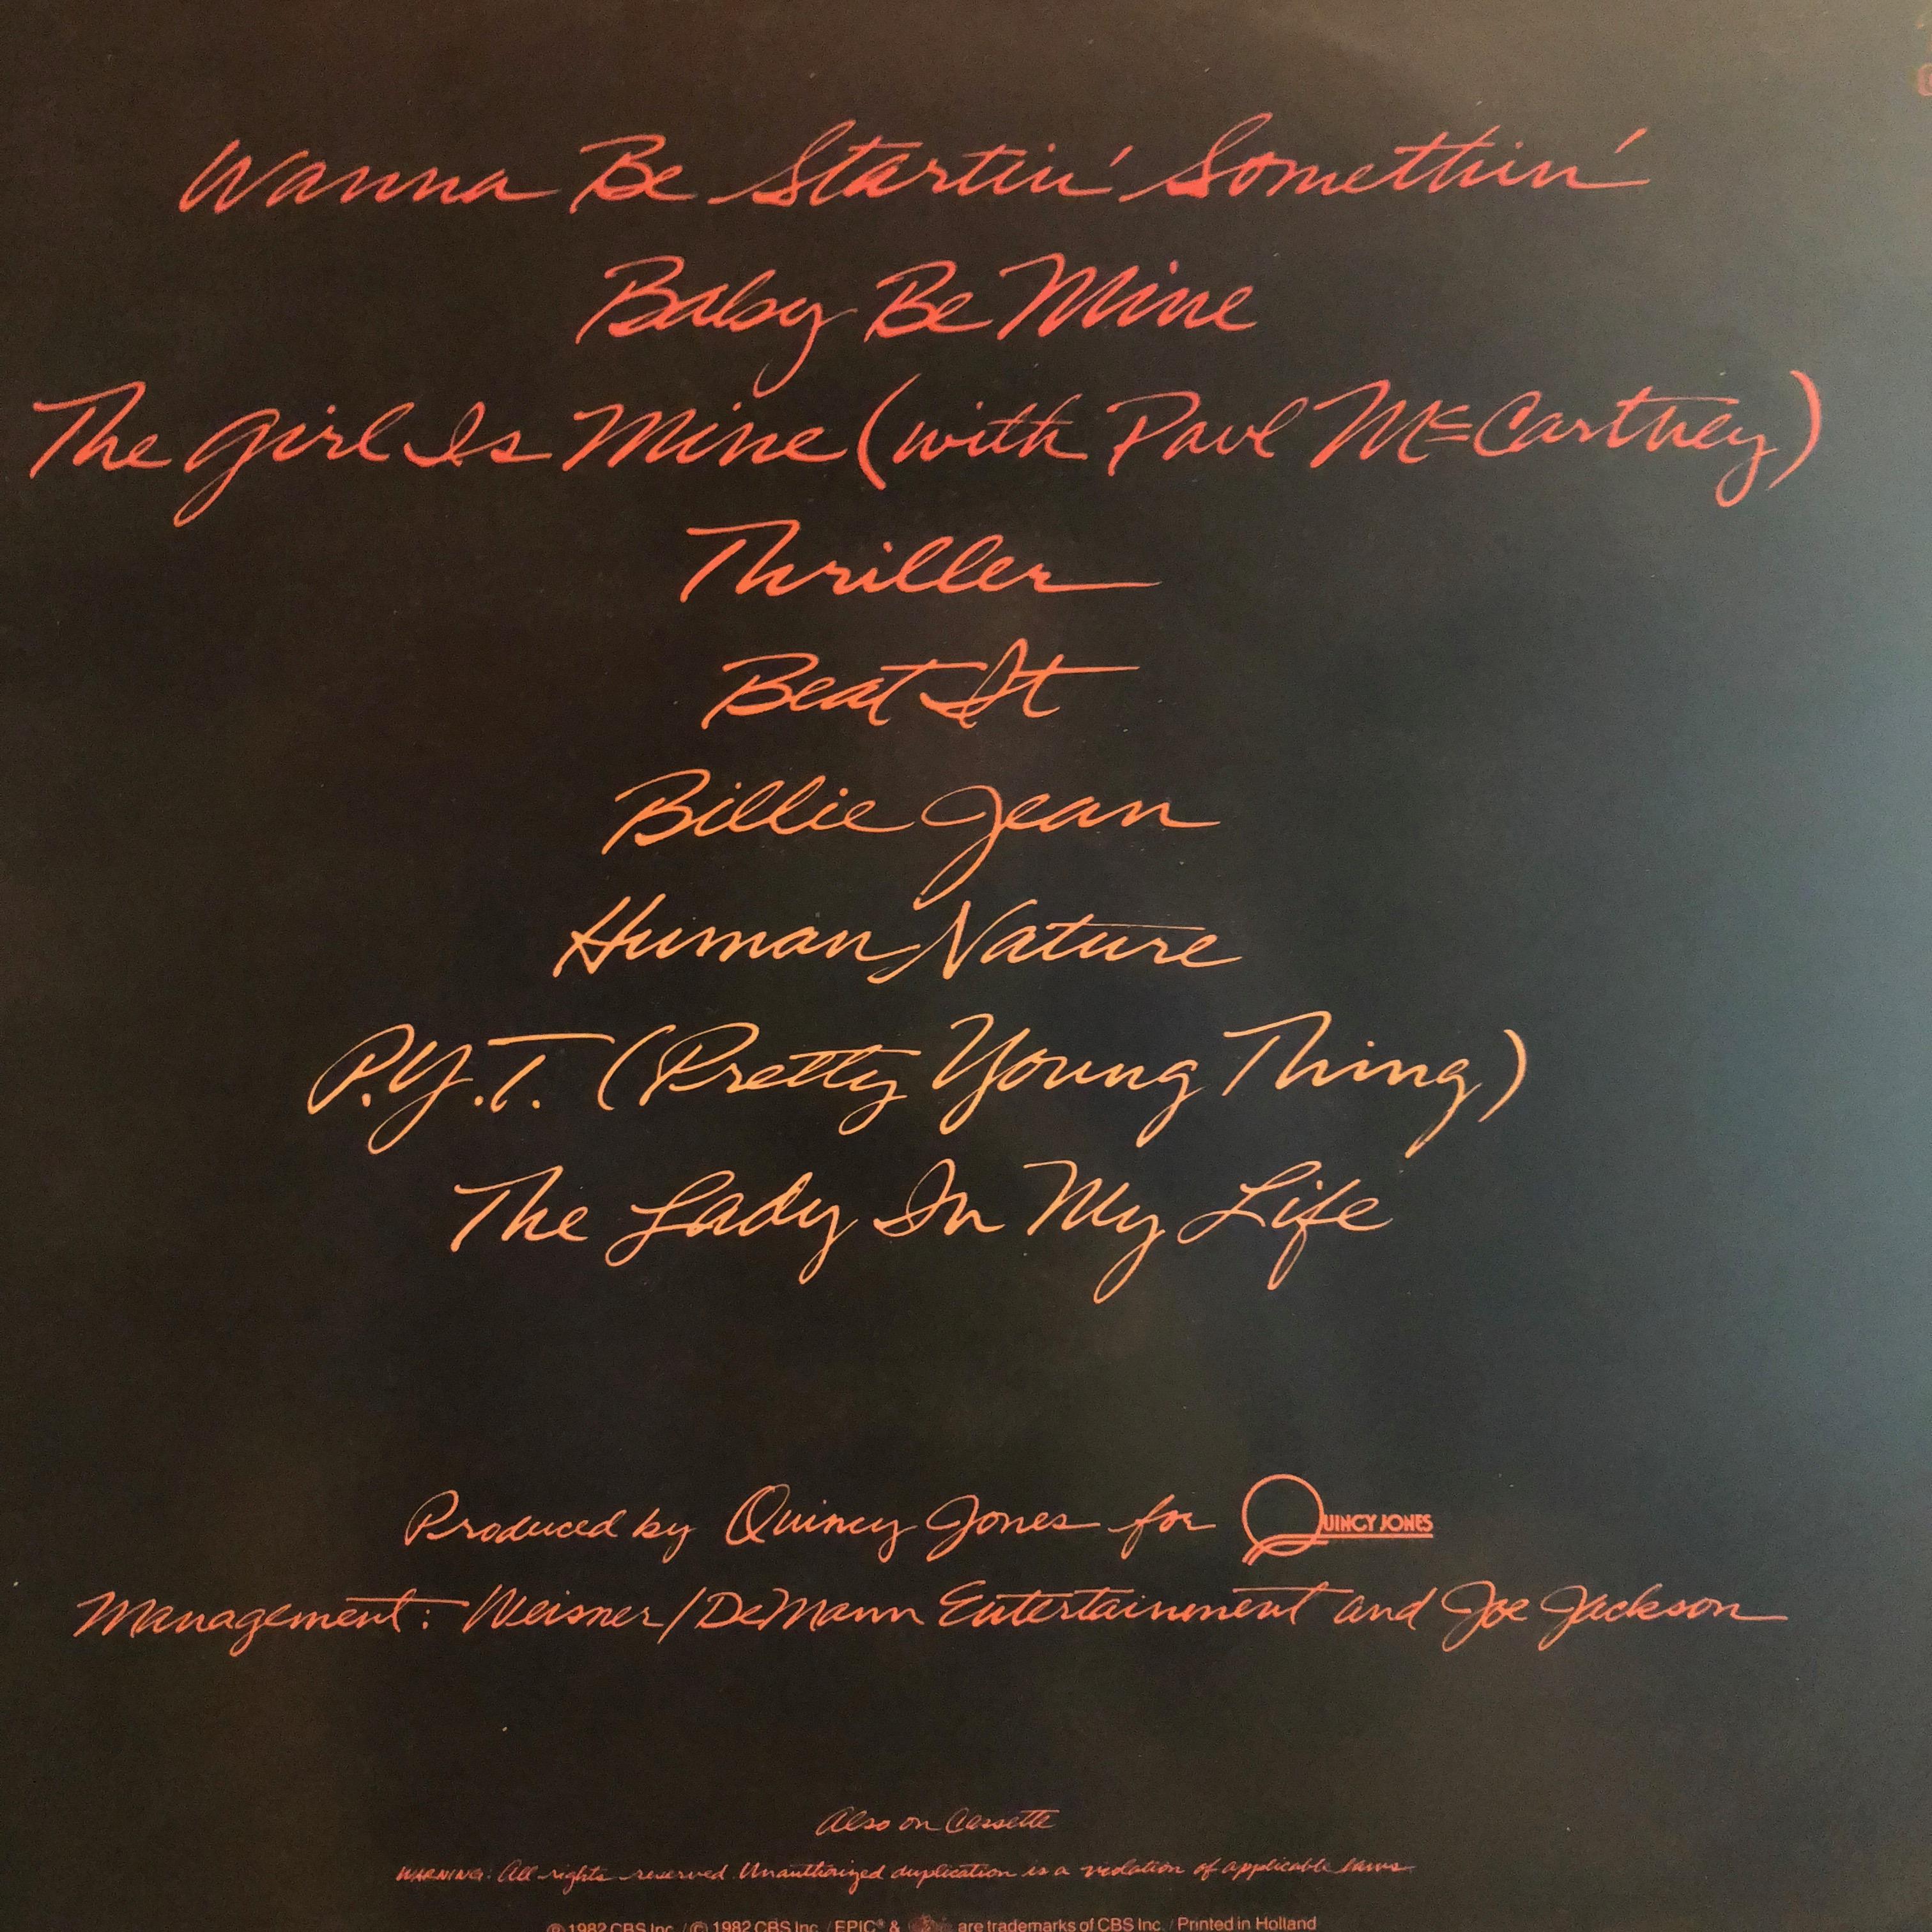 Michael Jackson - Thriller - Cover Back